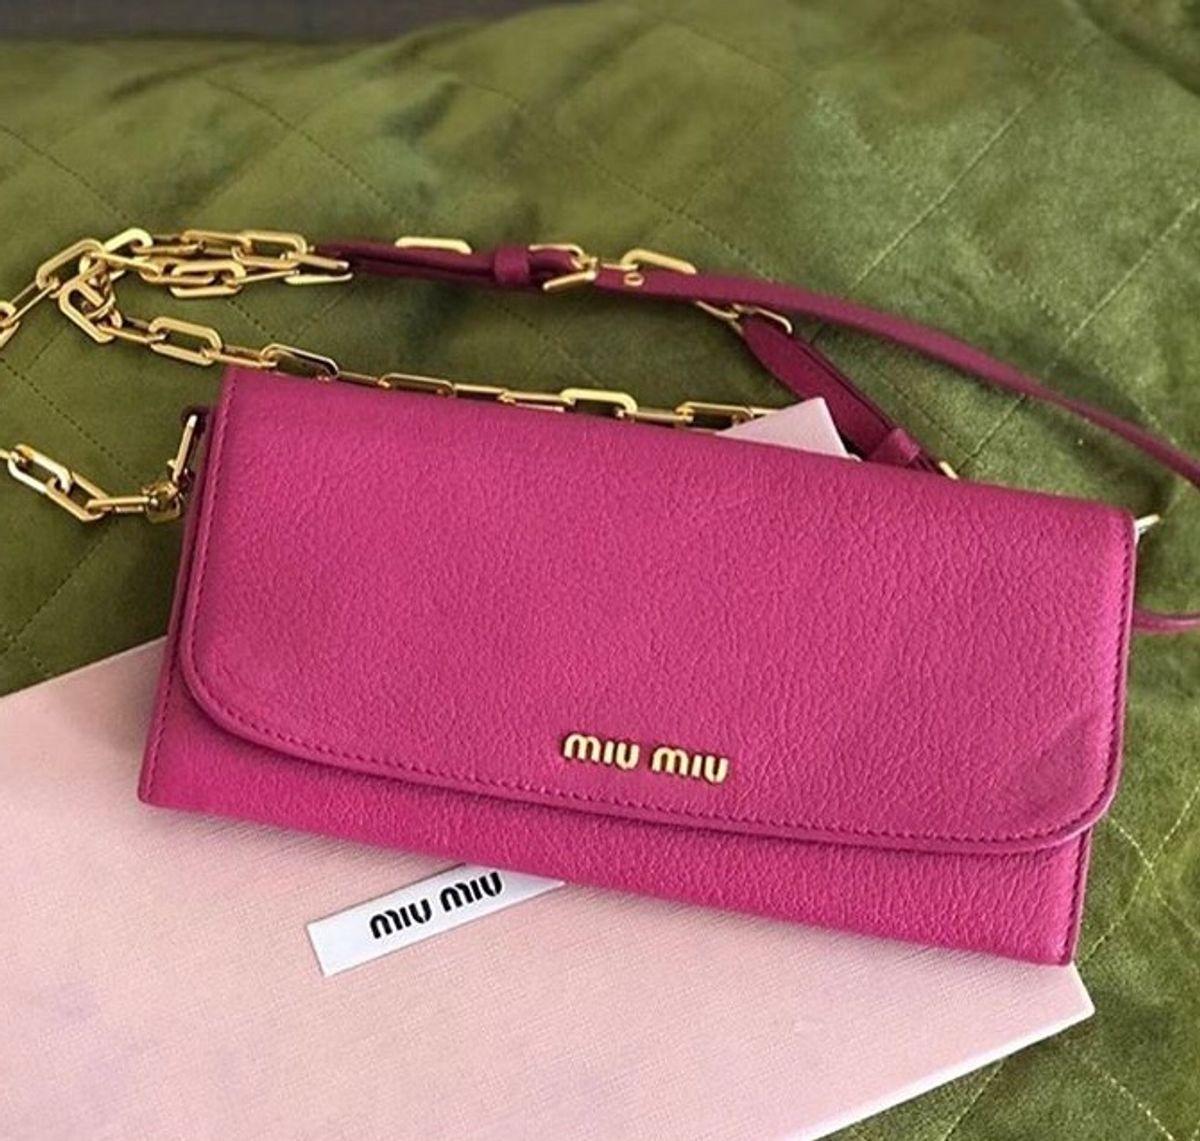 bolsa miumiu wallet original - bolsas miu-miu